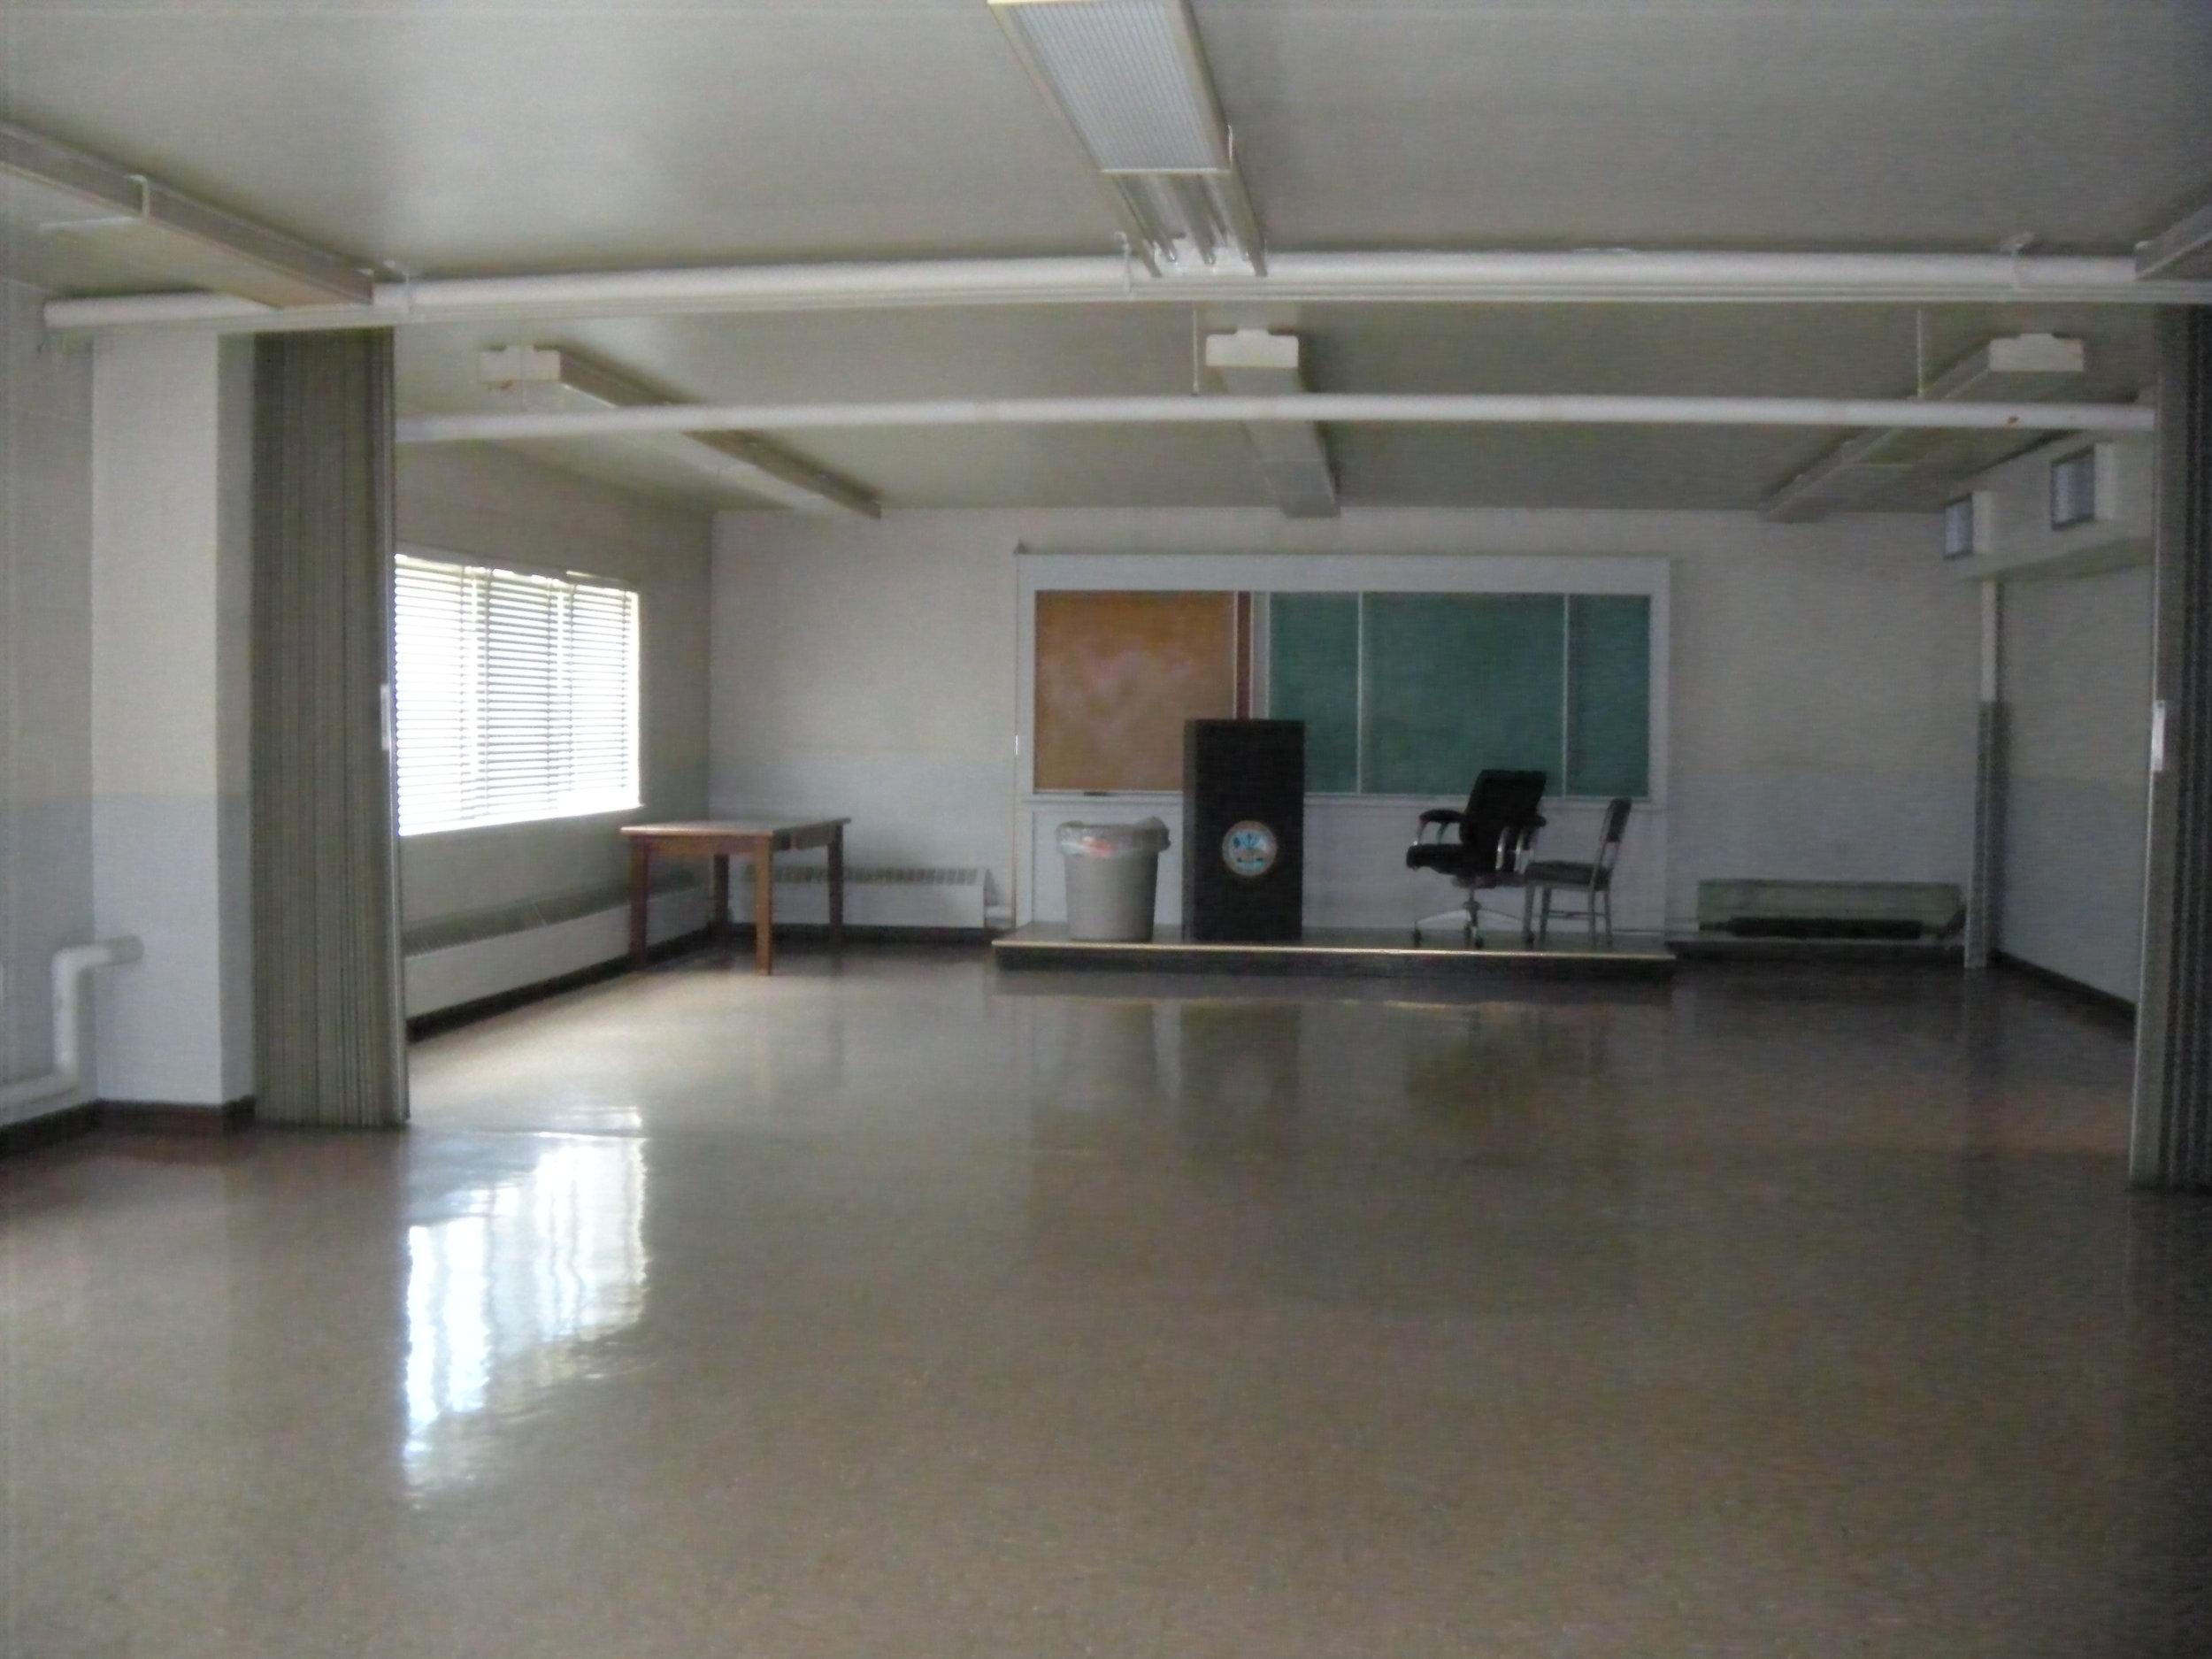 Washington County Senior Center (Before)